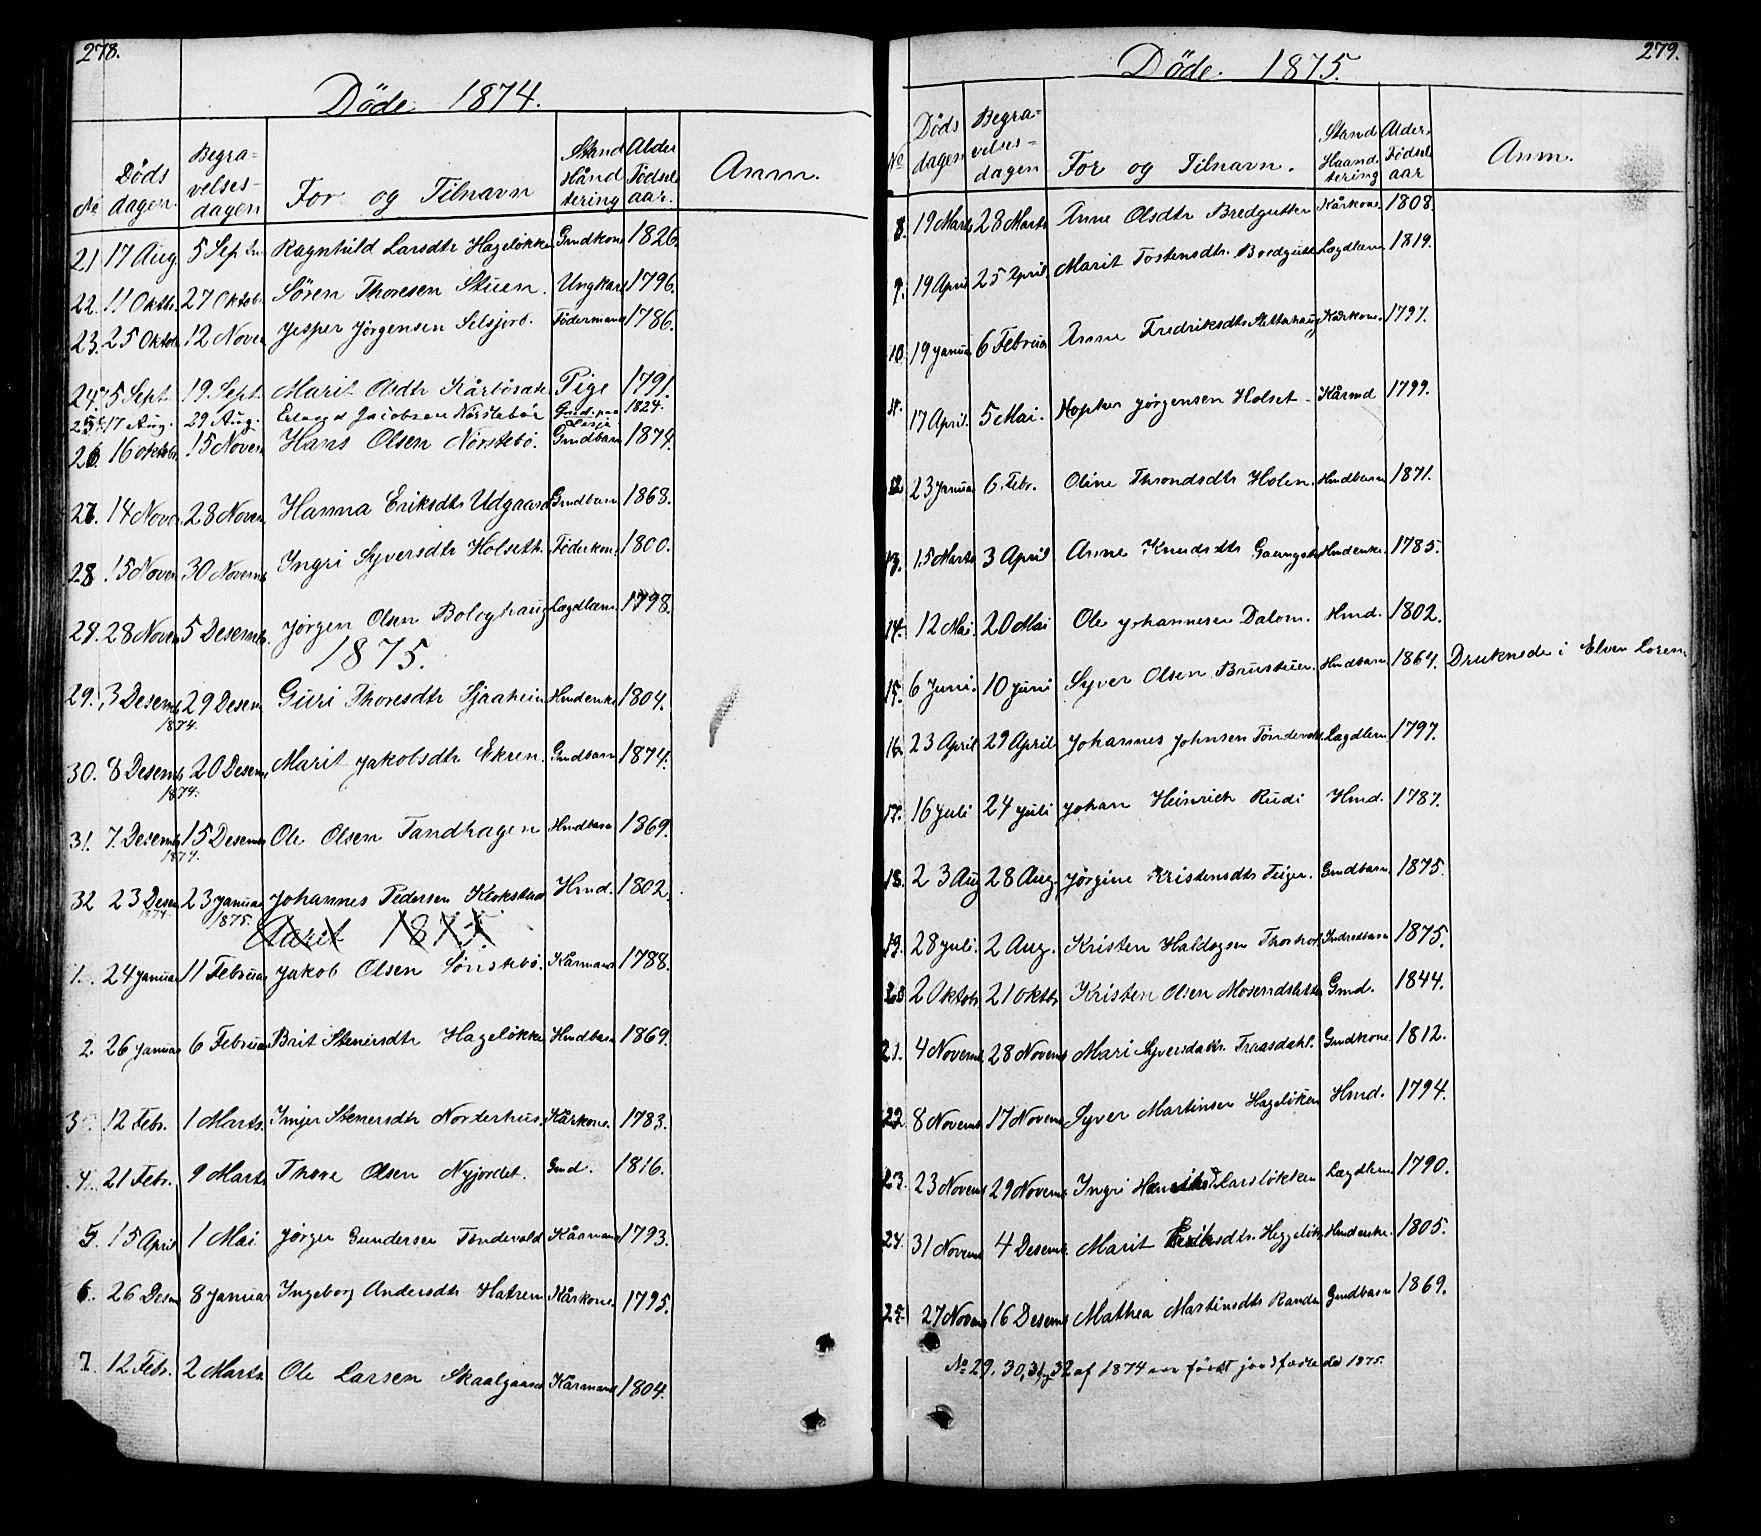 SAH, Lesja prestekontor, Klokkerbok nr. 5, 1850-1894, s. 278-279